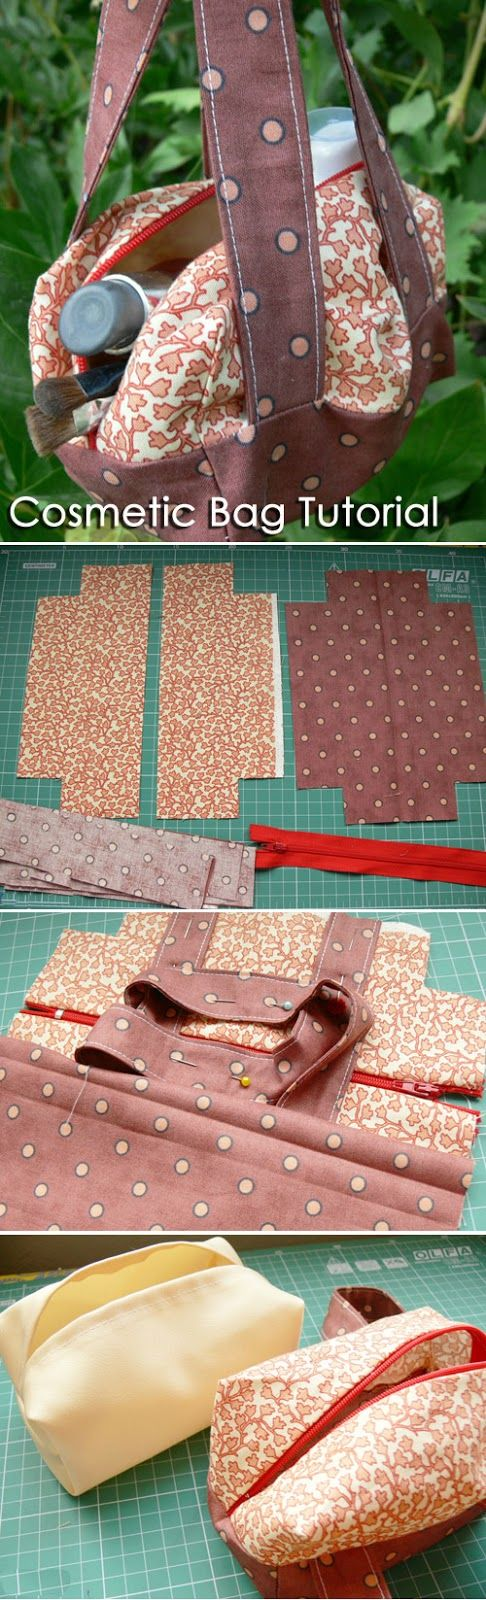 Cosmetic bag sewing pattern, makeup bag pattern. DIY Tutorial - Сумочка на молнии http://www.handmadiya.com/2015/09/handbag-zipper-cosmetic-bag.html